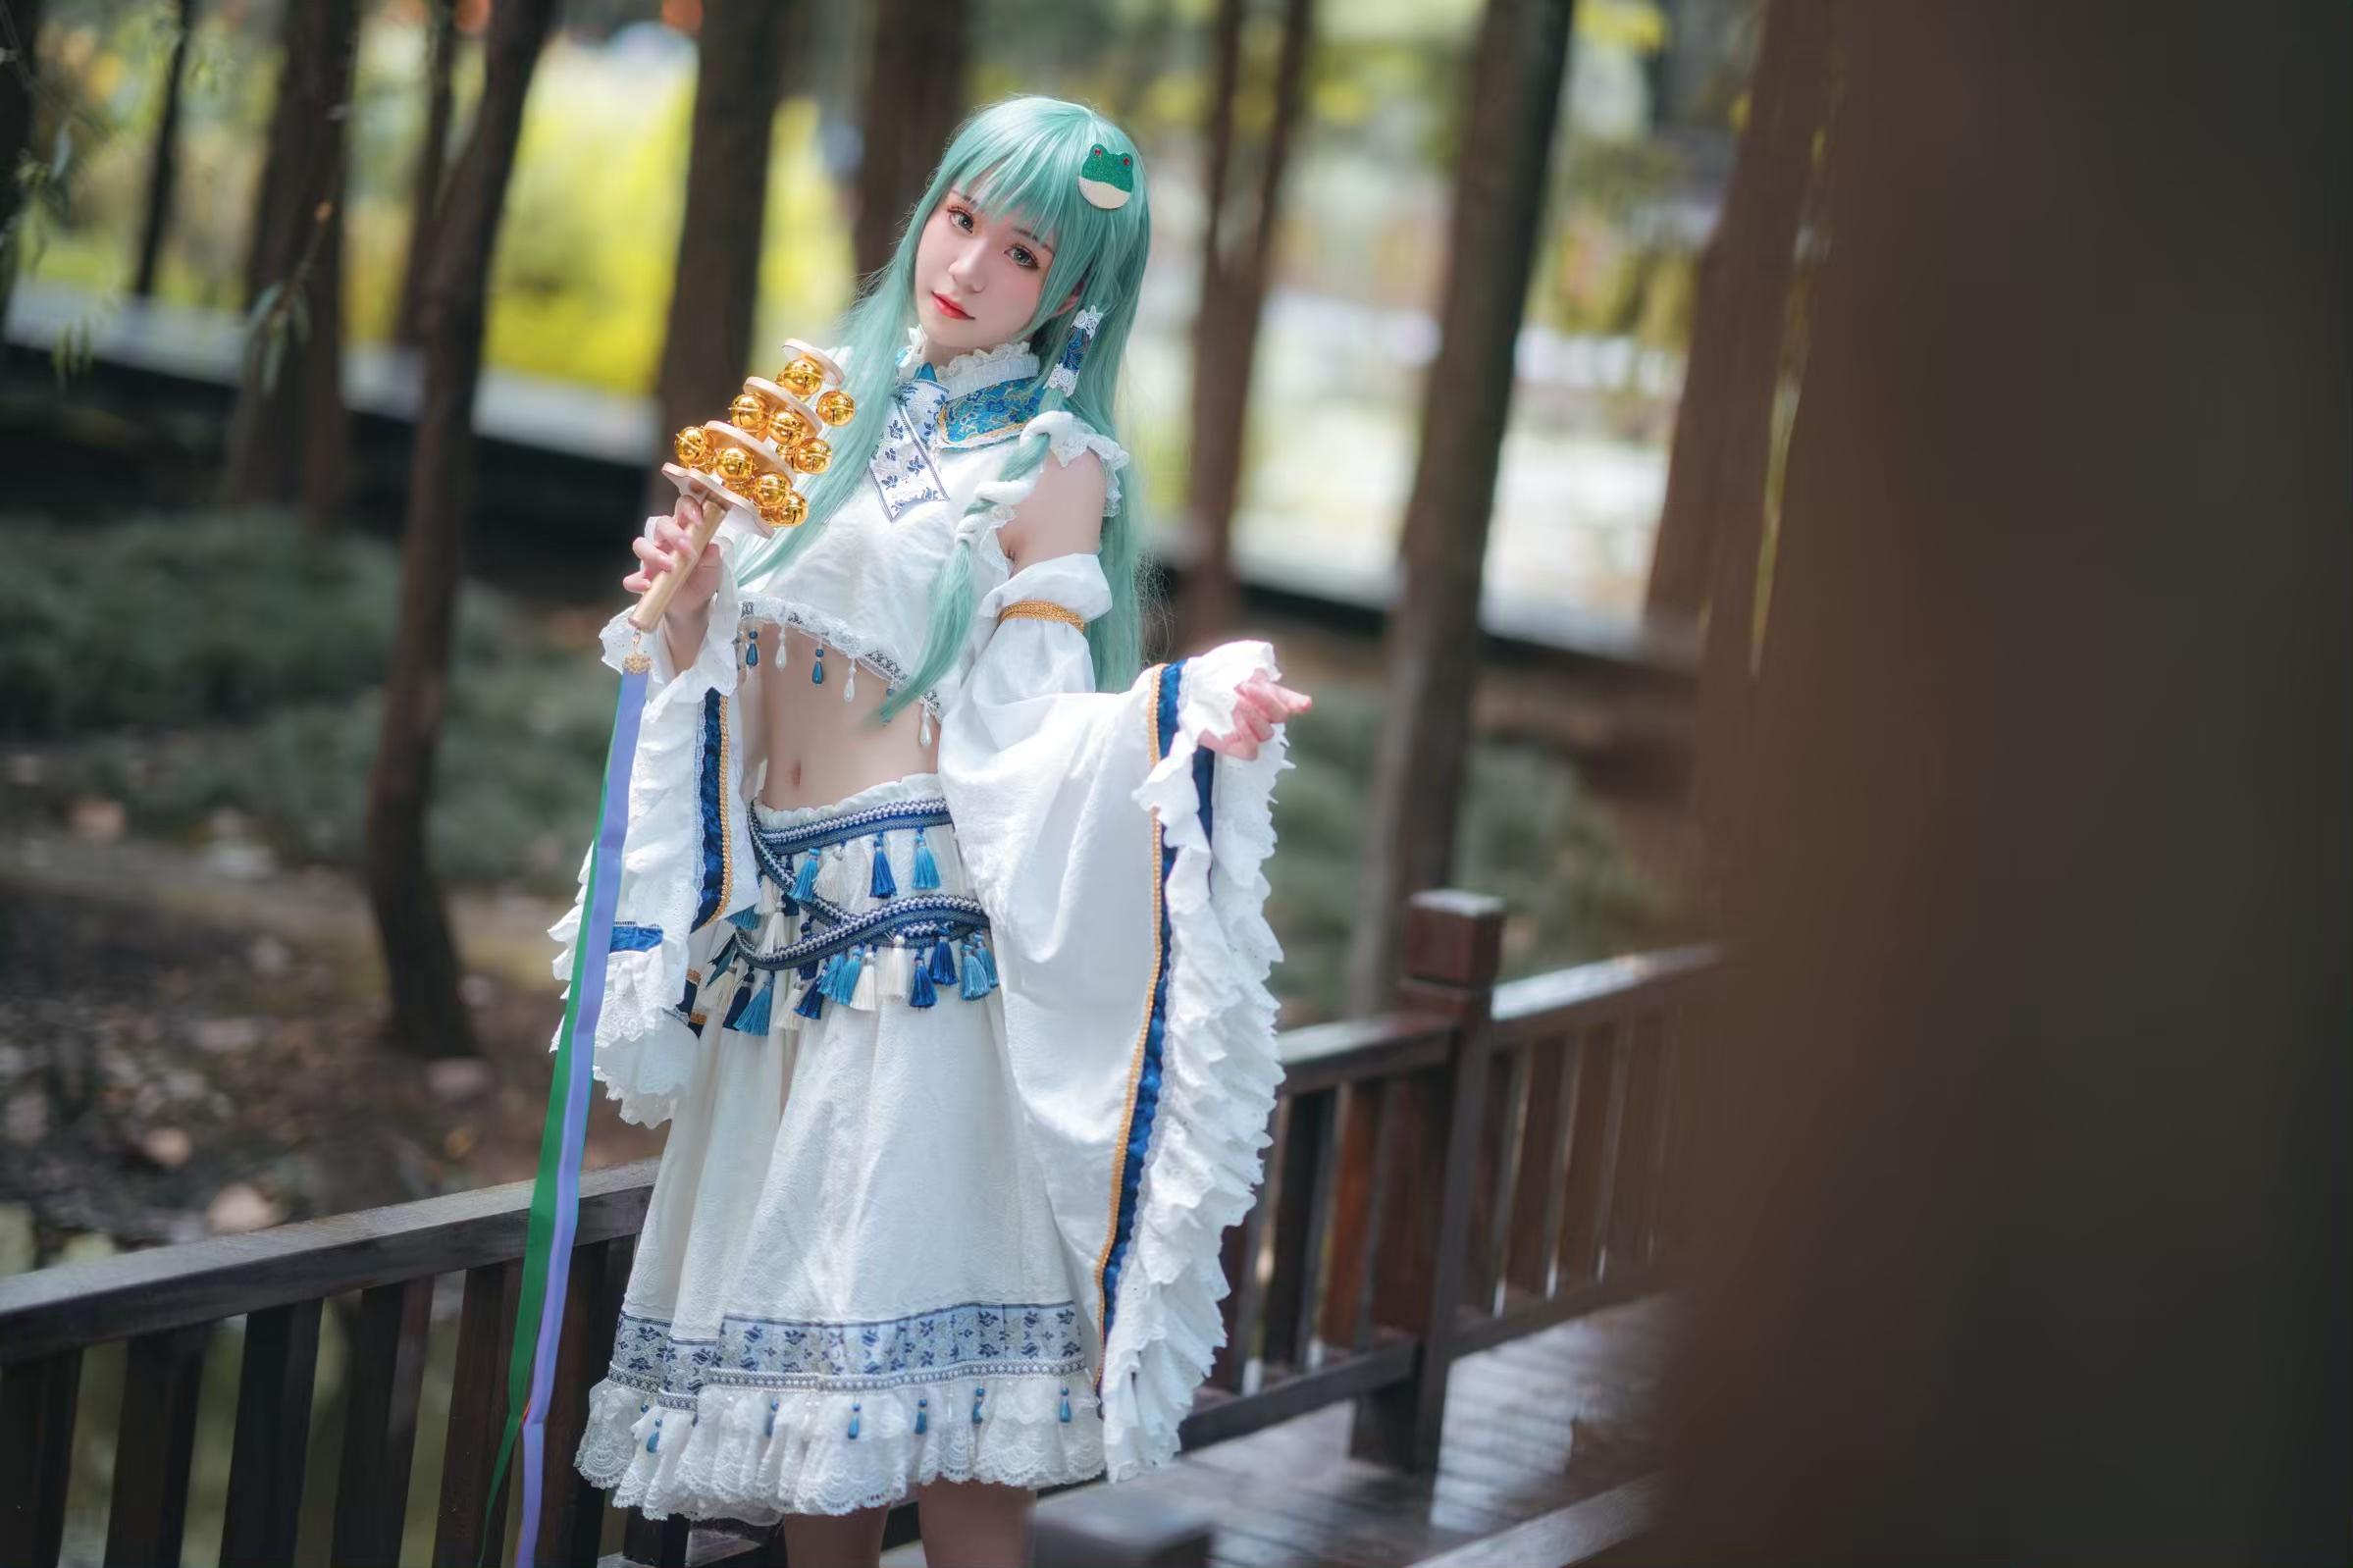 《东方PROJECT》正片cosplay【CN:Rin__】-第5张